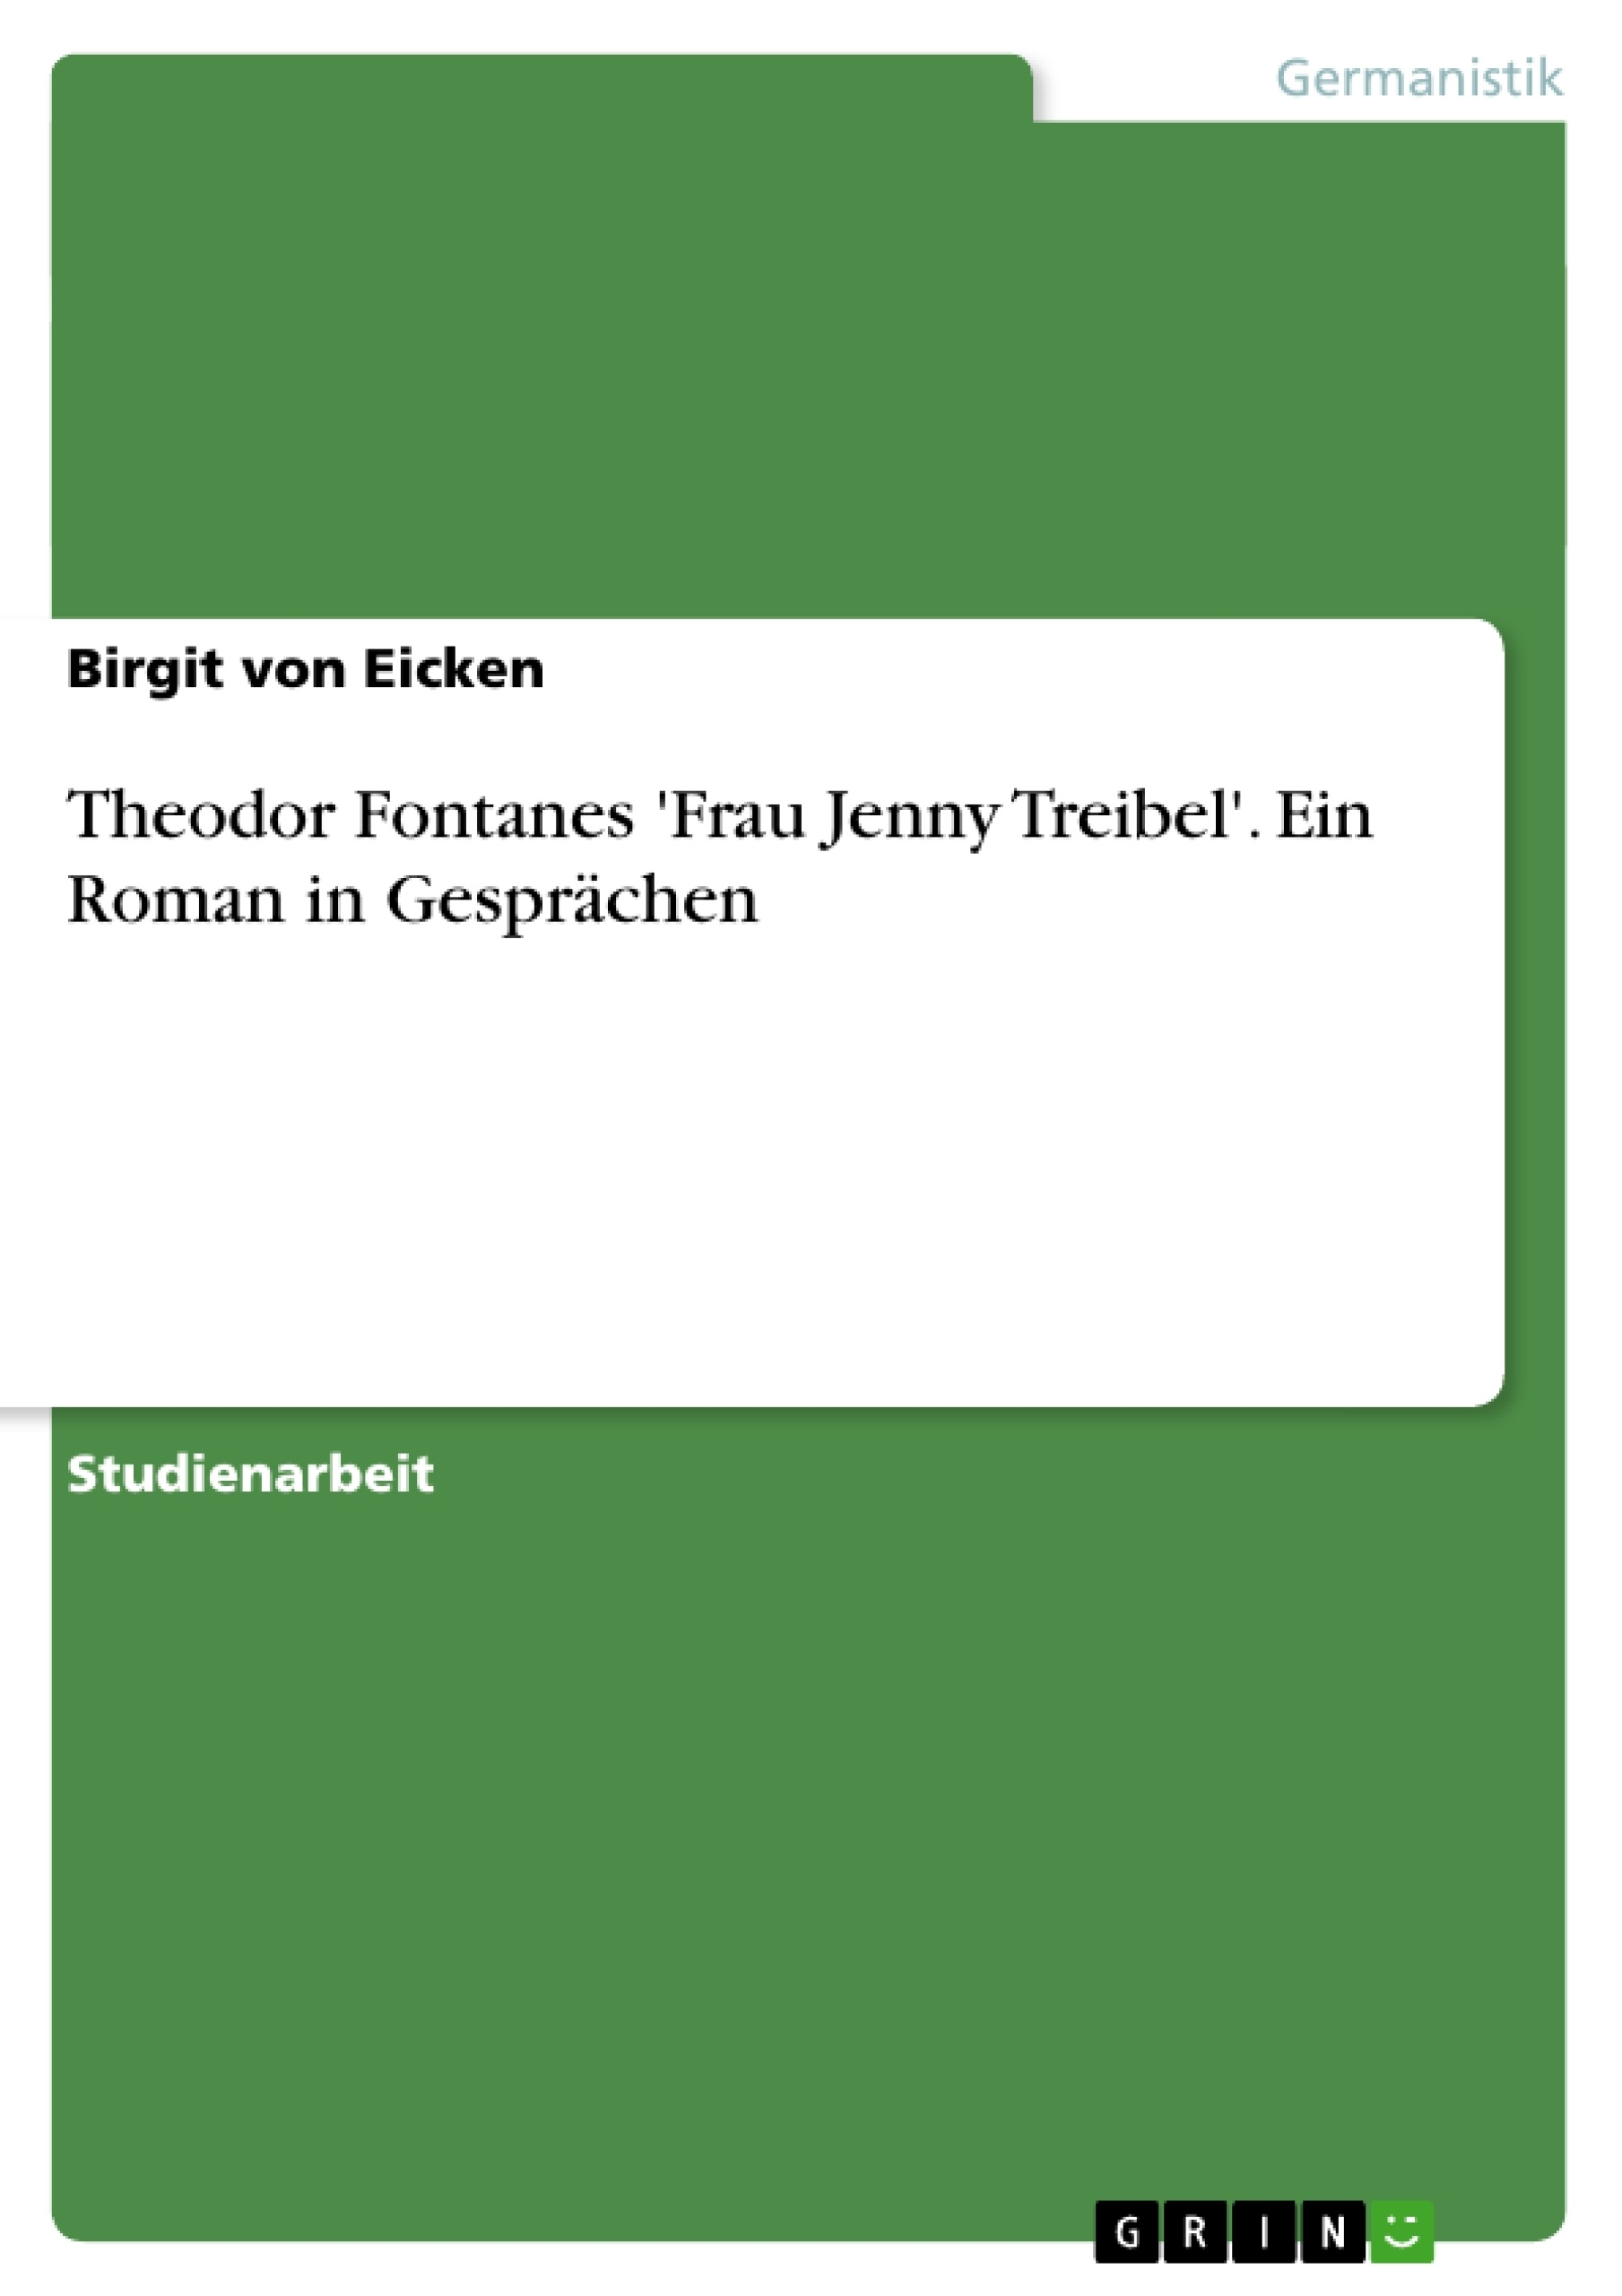 Titel: Theodor Fontanes 'Frau Jenny Treibel'. Ein Roman in Gesprächen